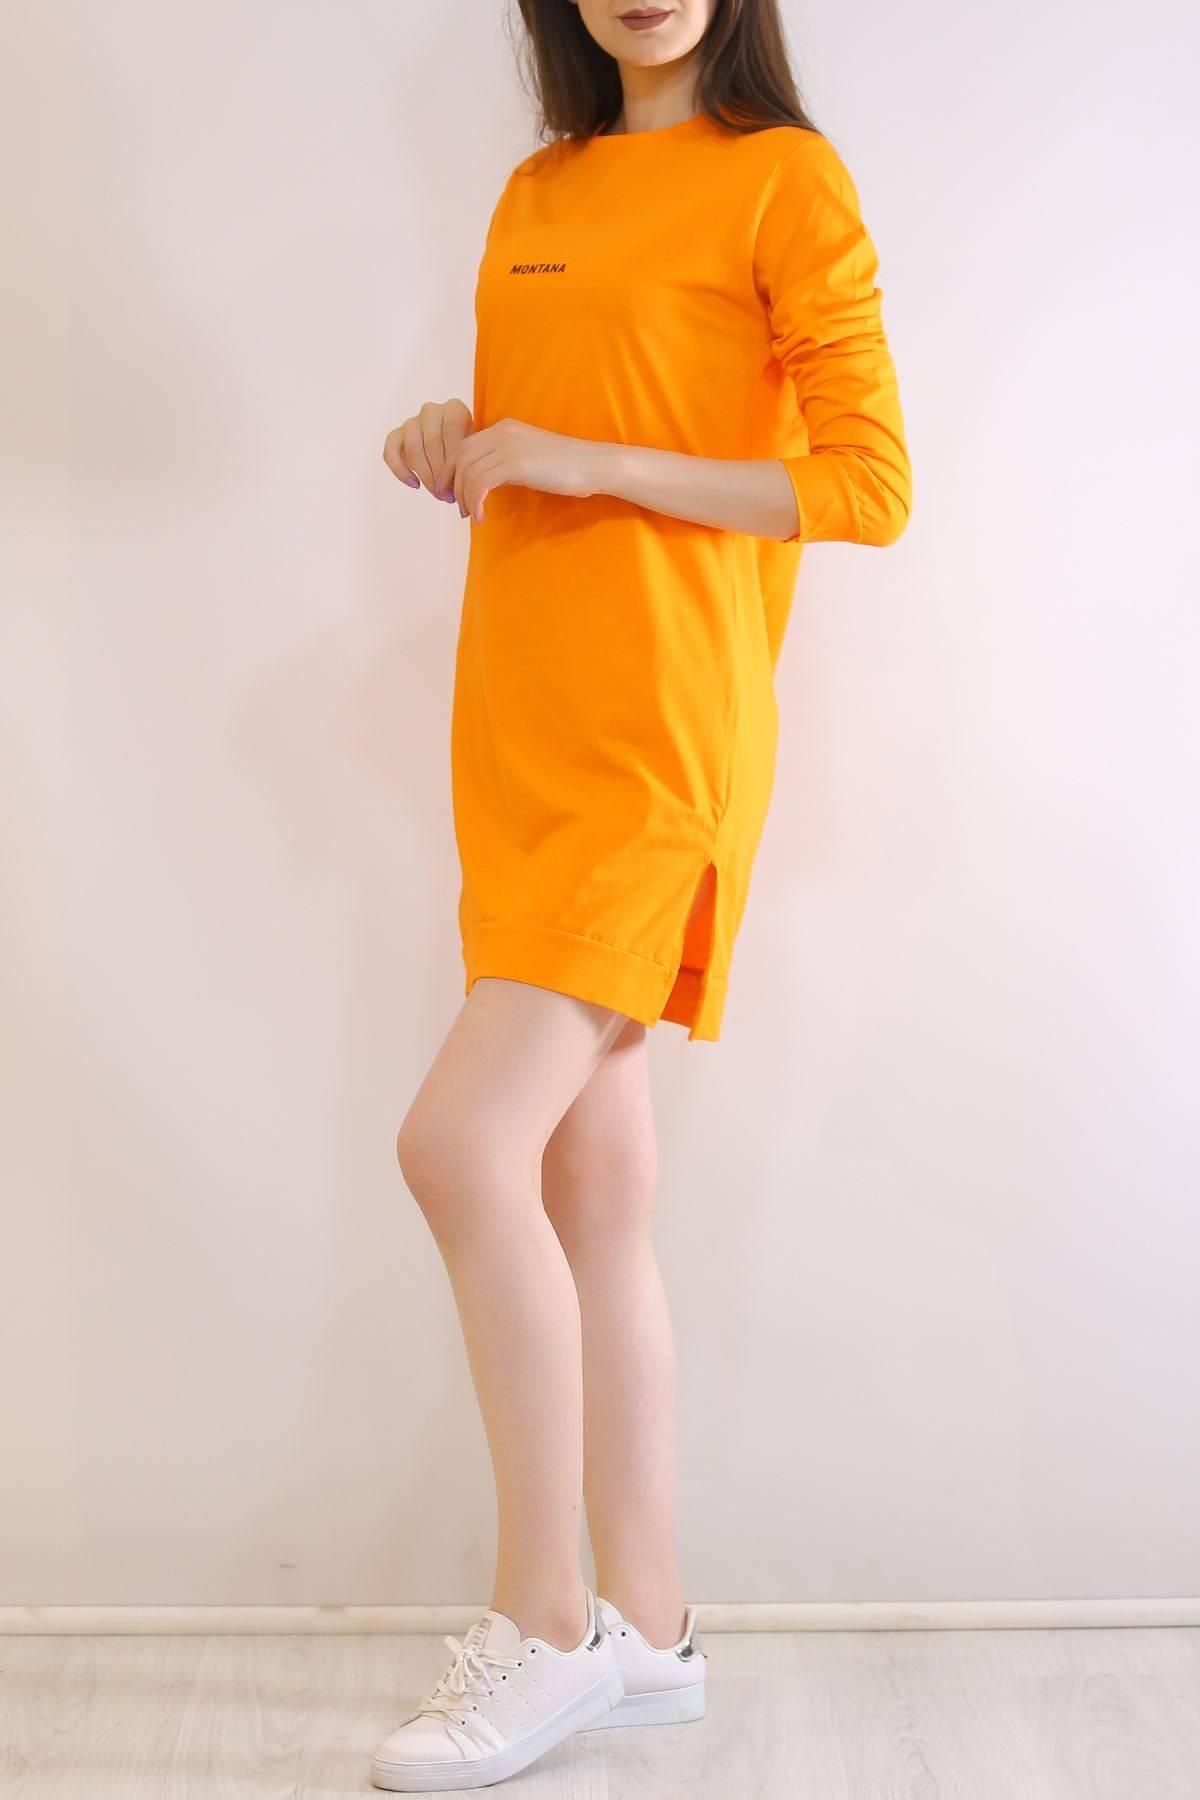 İki İplik Tunik Sweat Oranj - 3152.105.